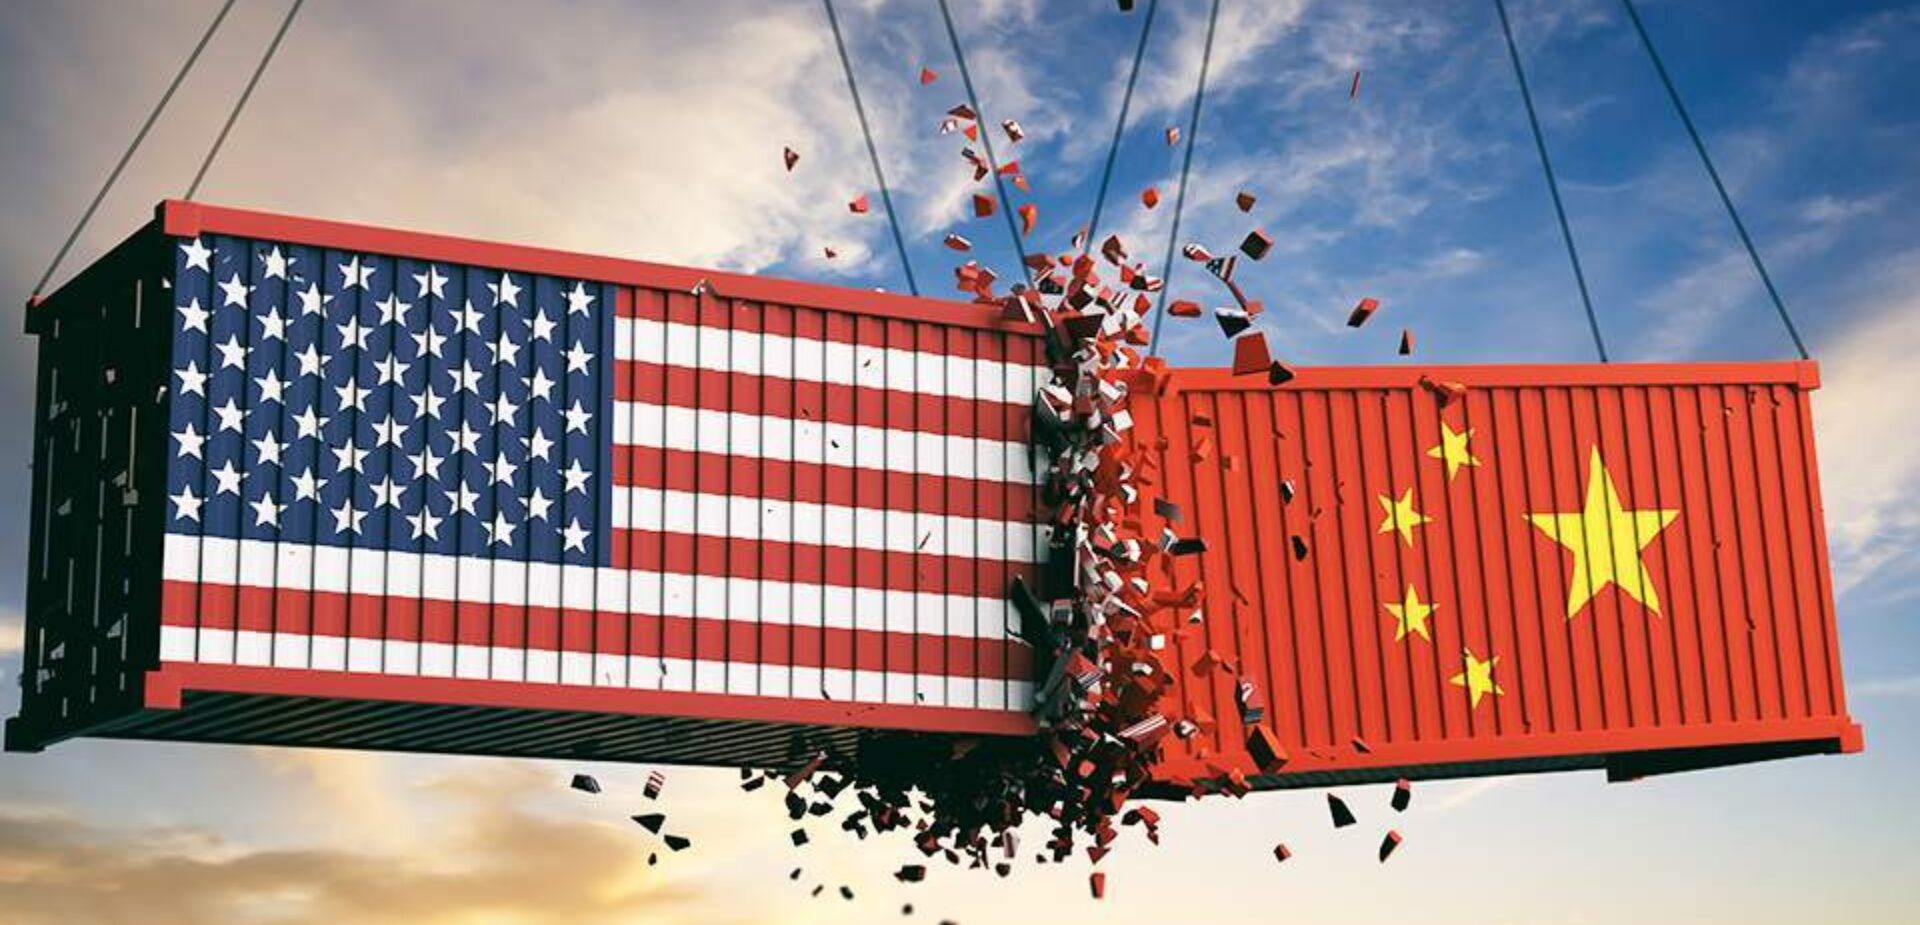 DW: Απειλεί το παγκόσμιο εμπόριο η διένεξη ΗΠΑ-Κίνας